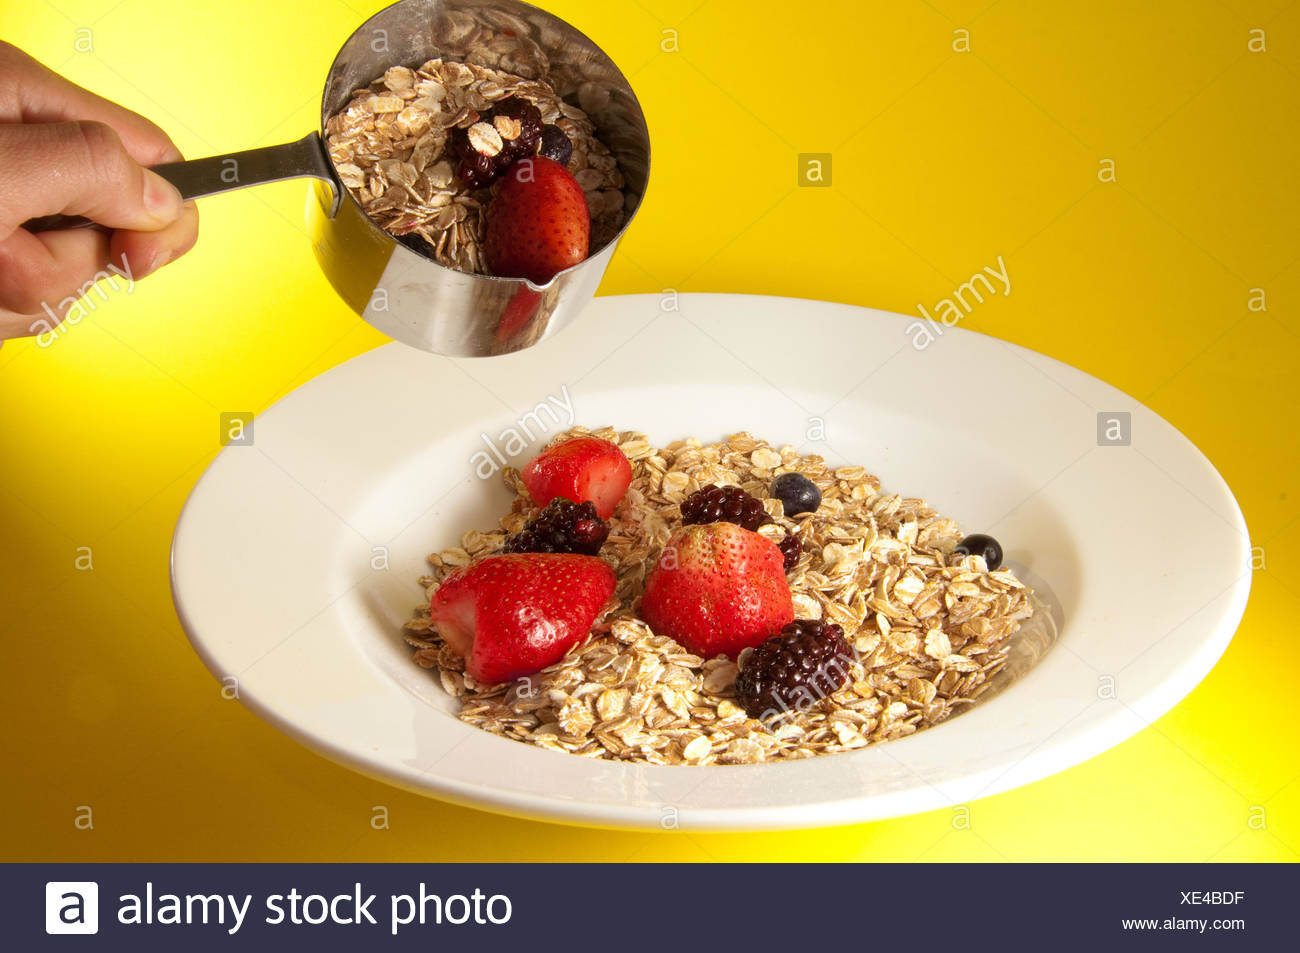 cereal food breakfeast Stock Photo